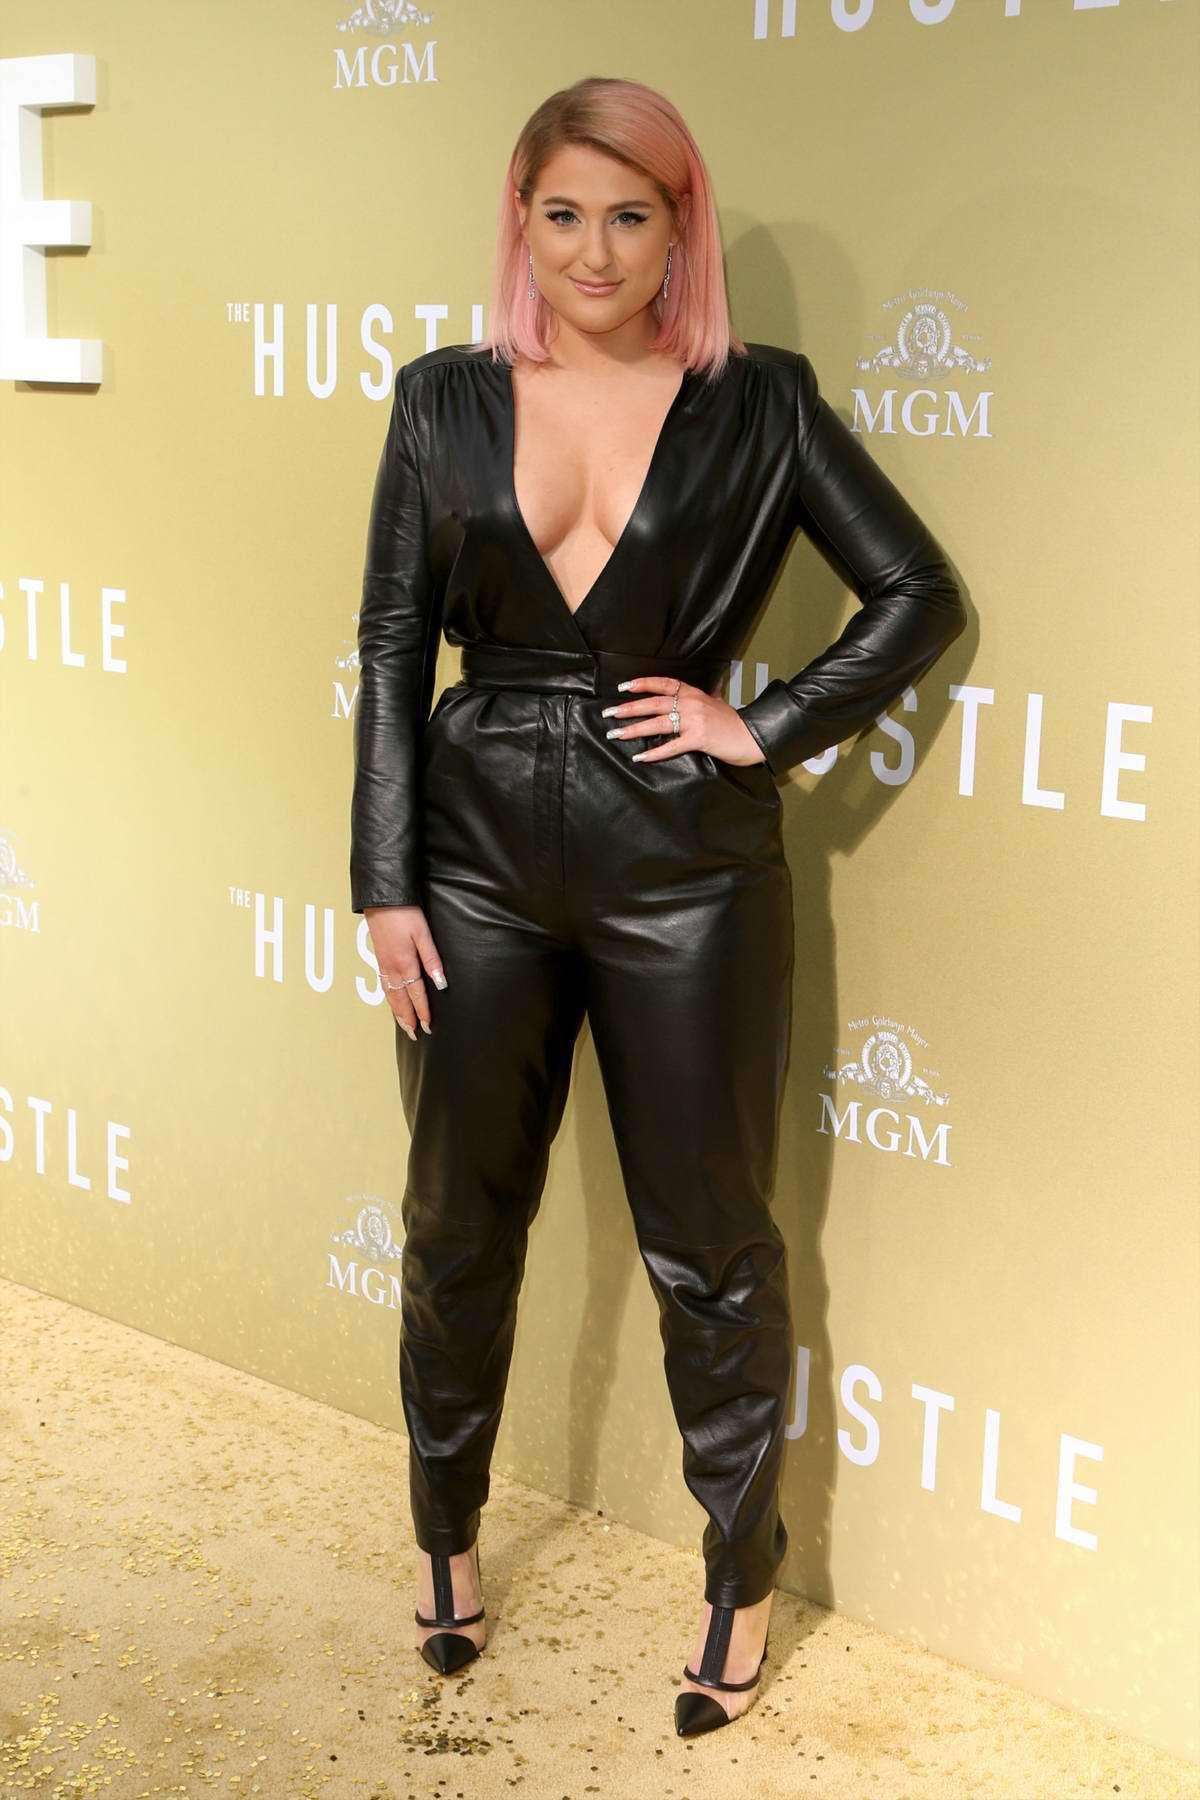 jumpsuit meghan trainor celebrity pants plunge v neck top pumps black leather leather pants